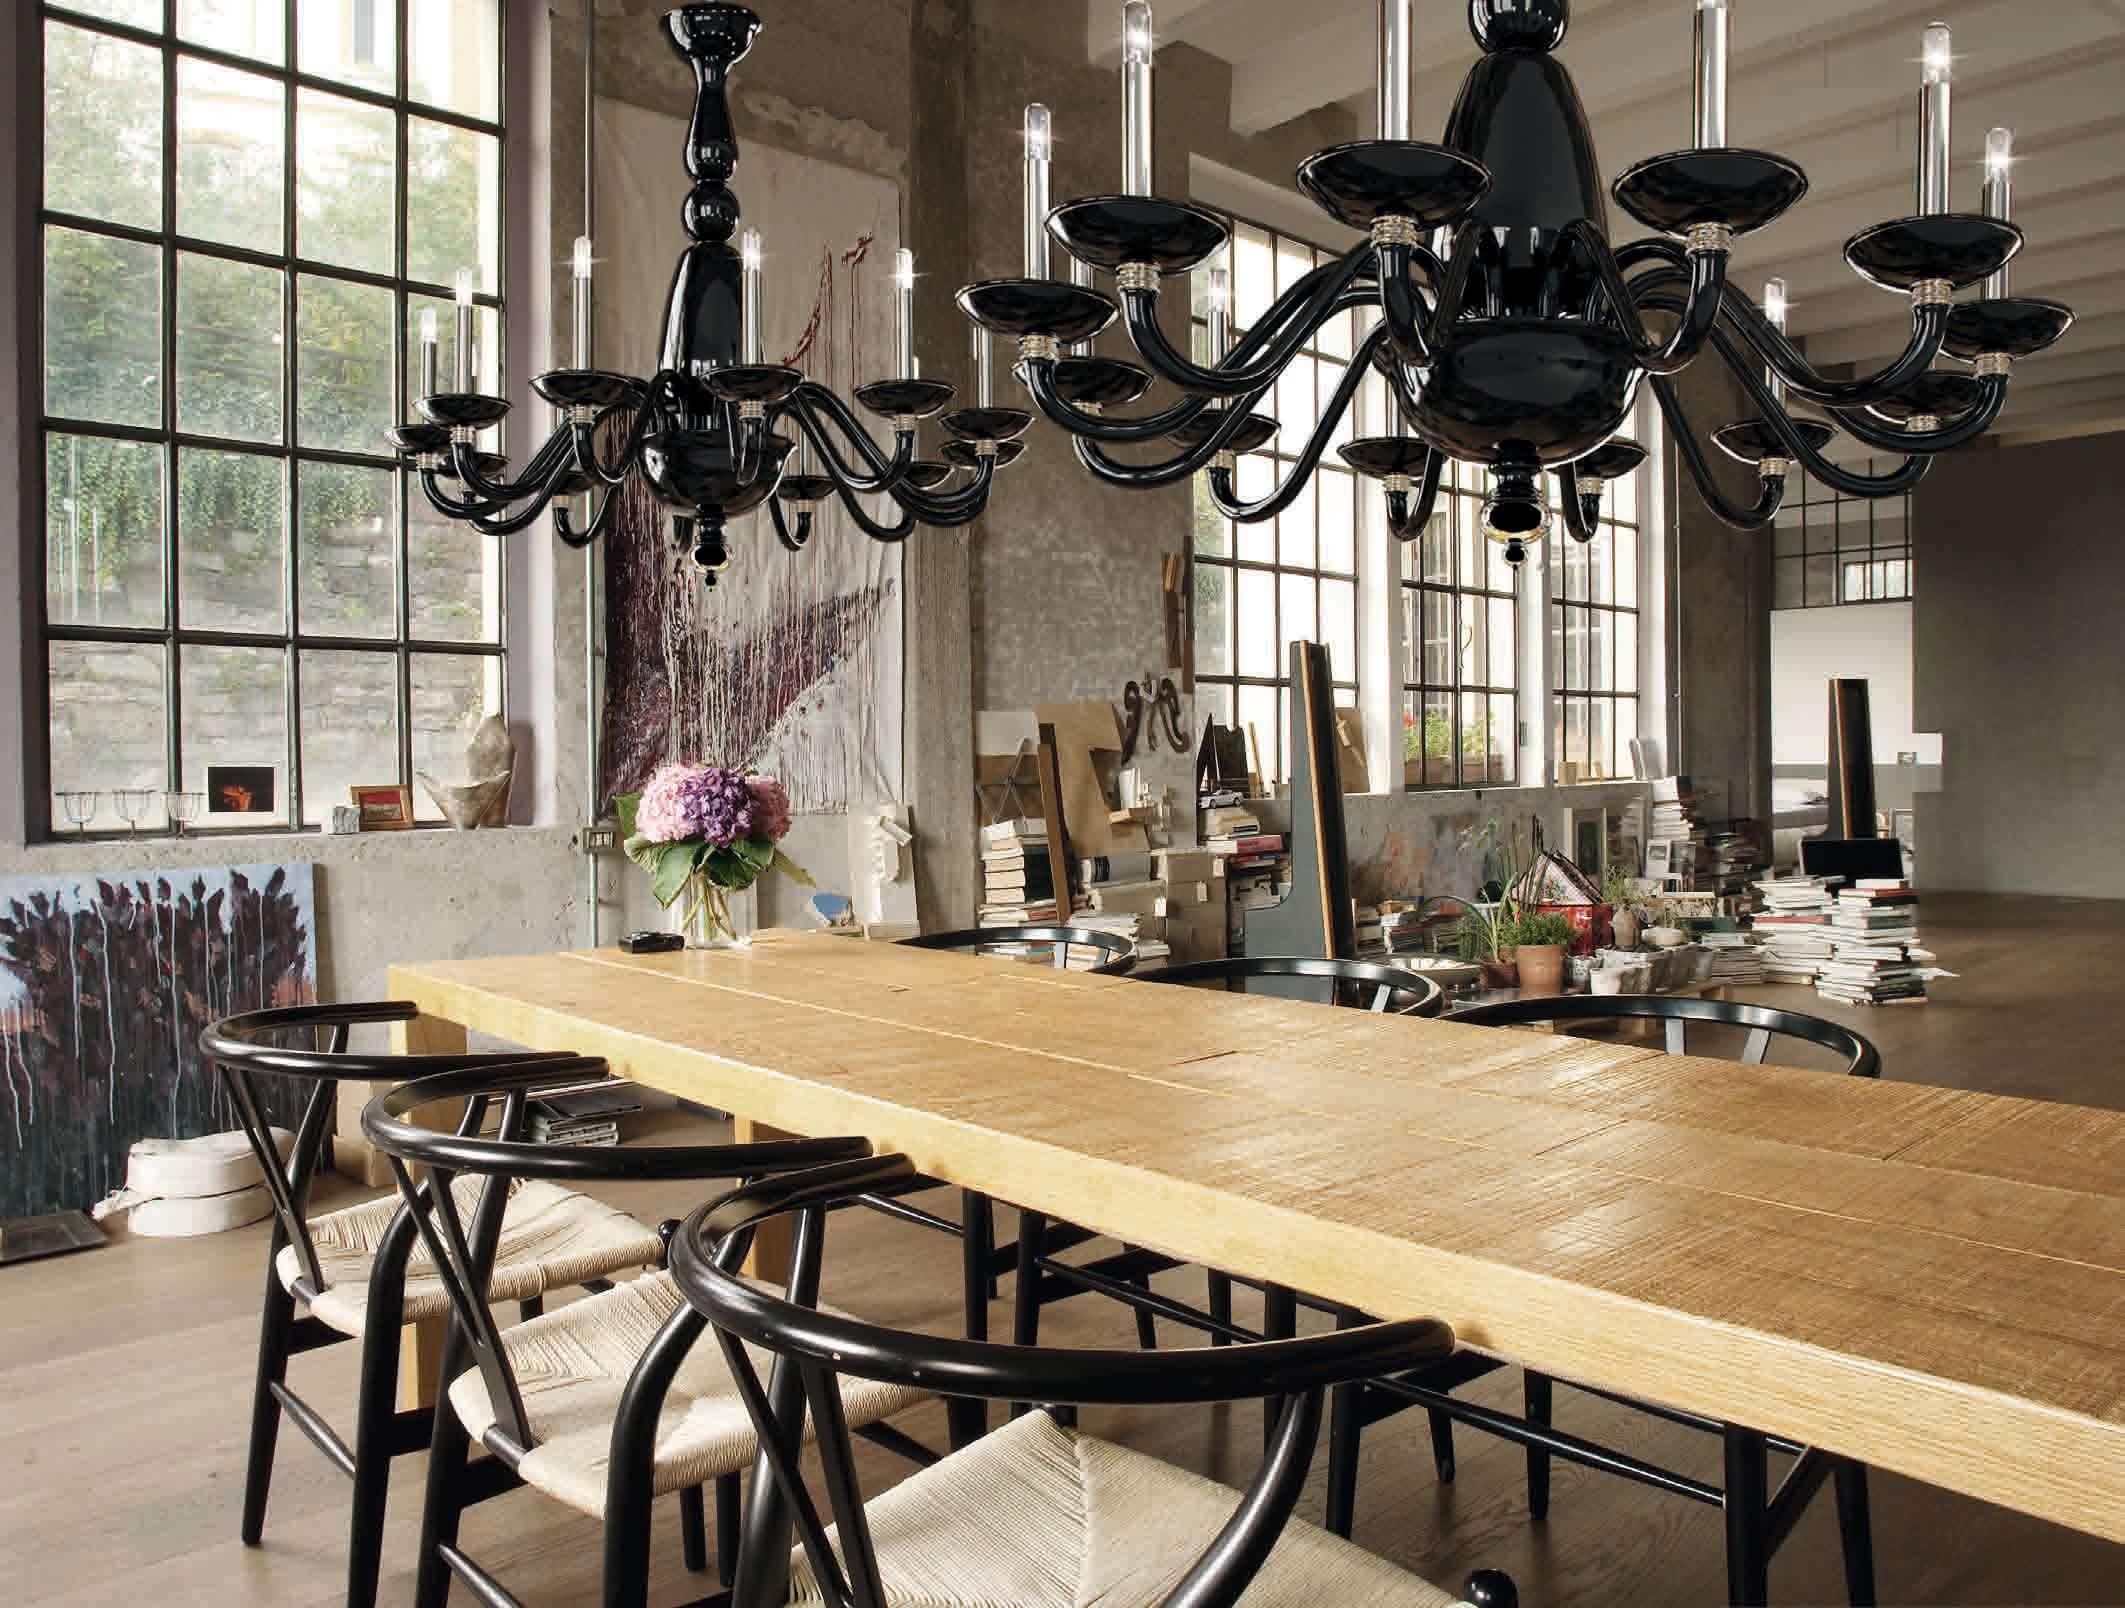 interior-murano-chandeliers-barovier Palladiano